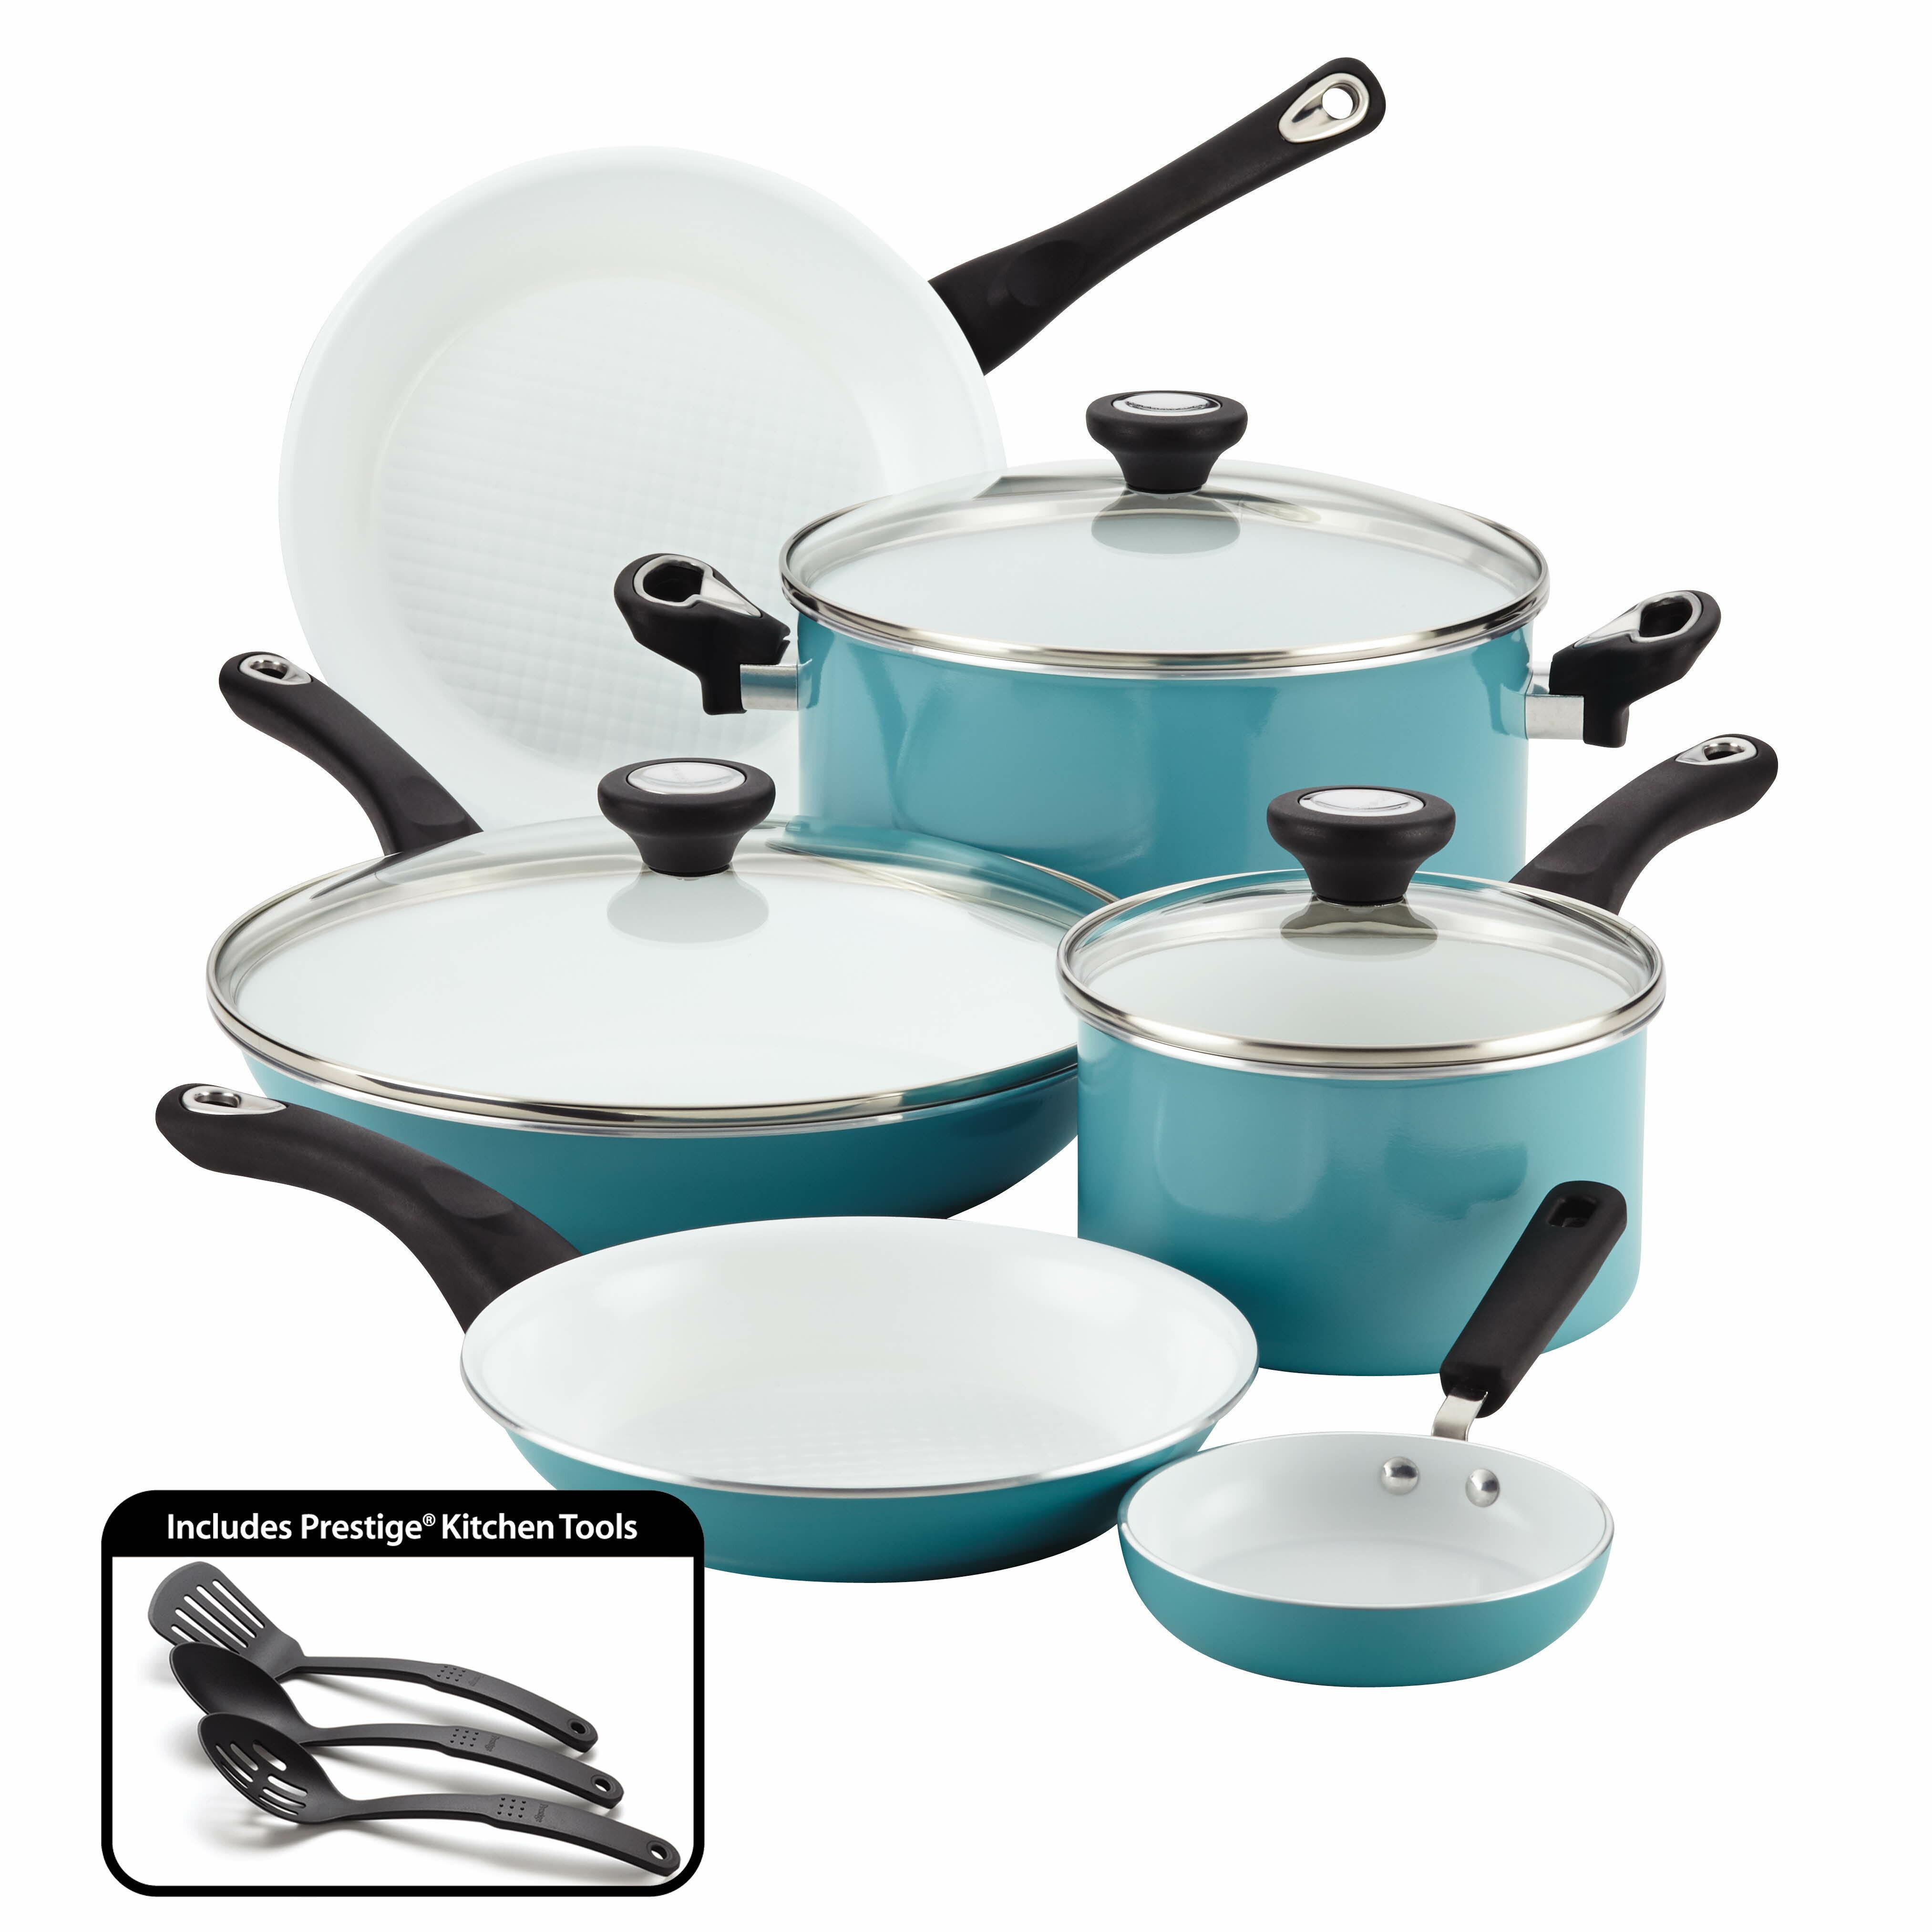 Farberware Purecook 12 Piece Non-Stick Cookware Set & Reviews | Wayfair